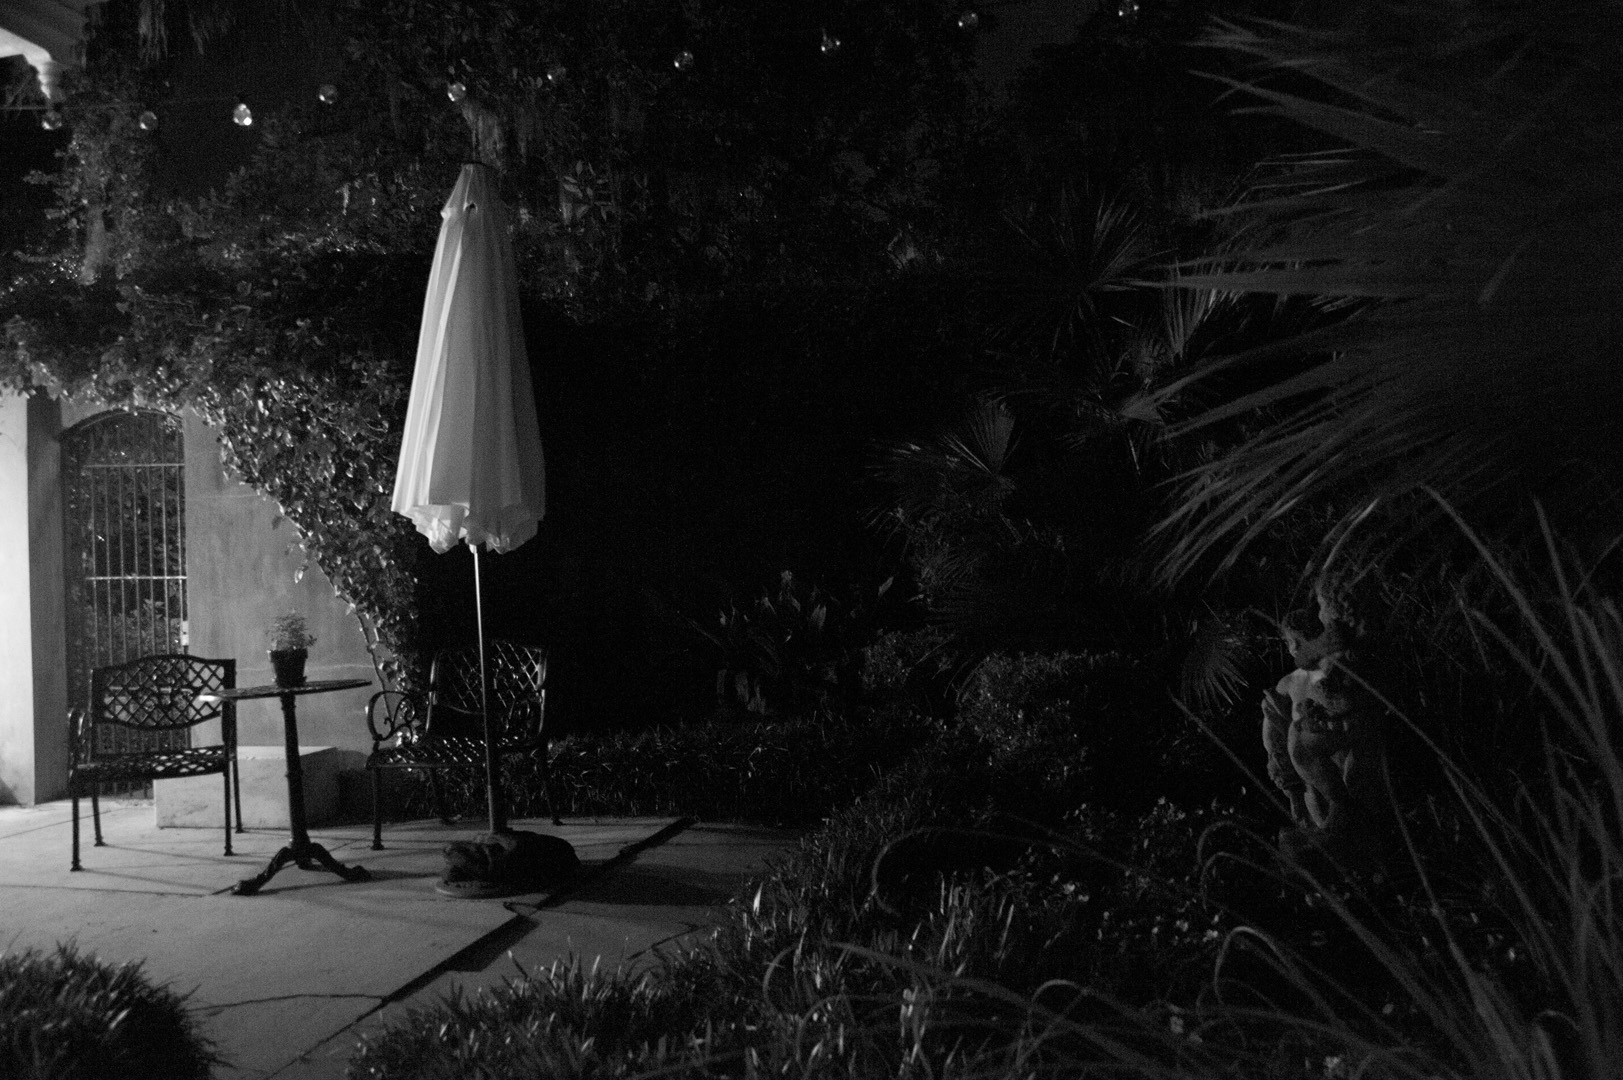 outside with umbrella Savana.jpg